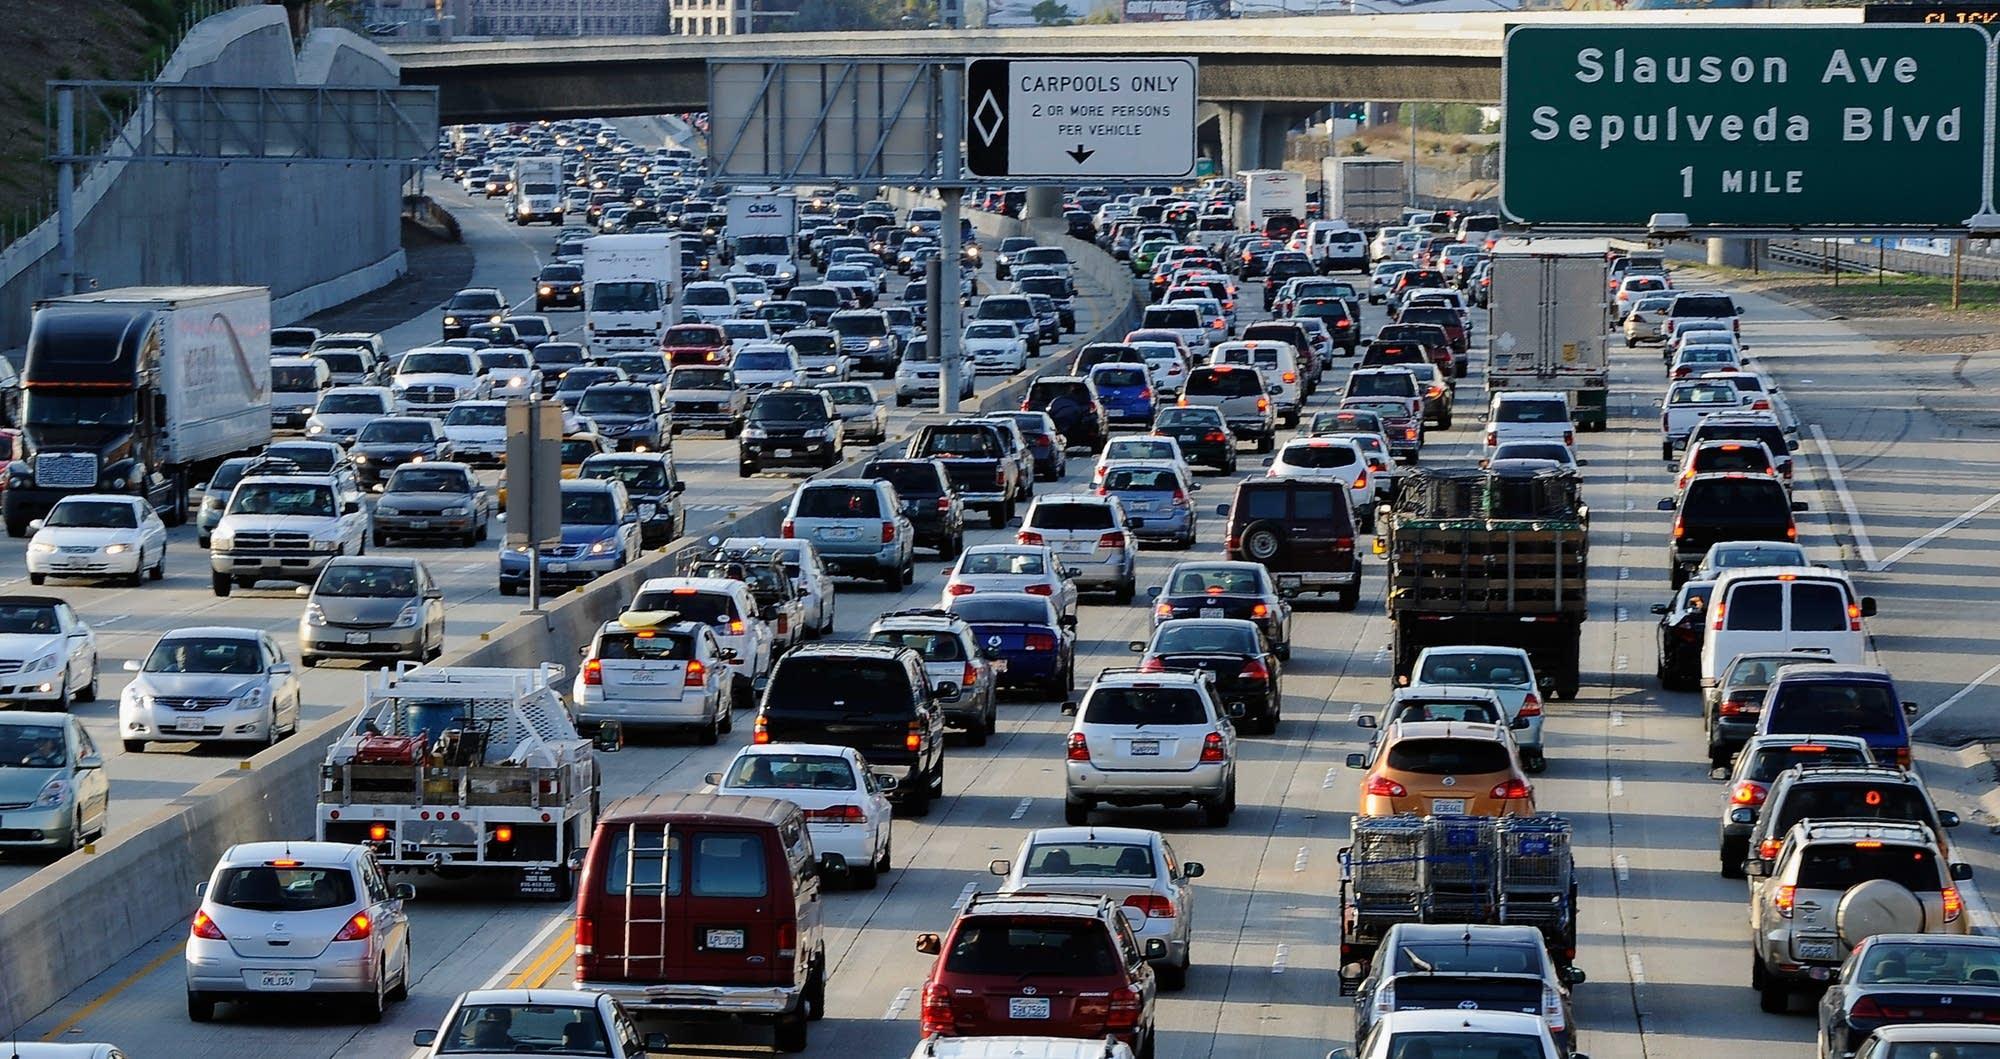 Los Angeles traffic jam